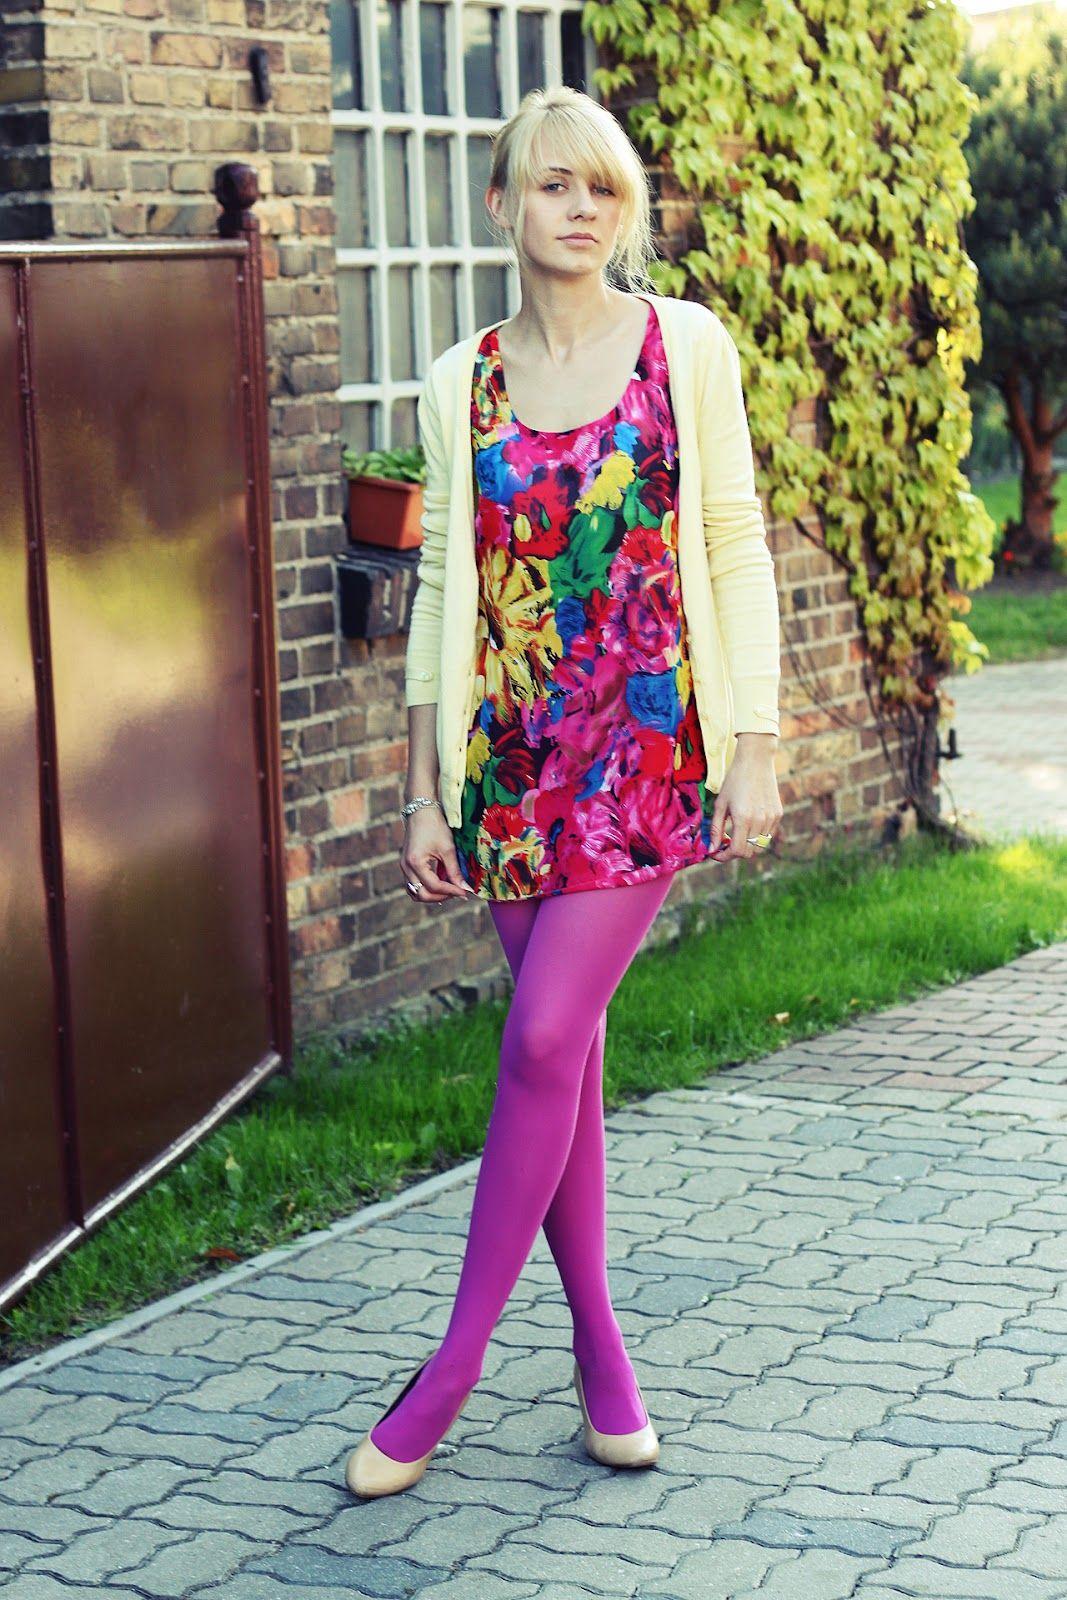 jenna coleman - Google Search | Beauty | Fashion tights ...